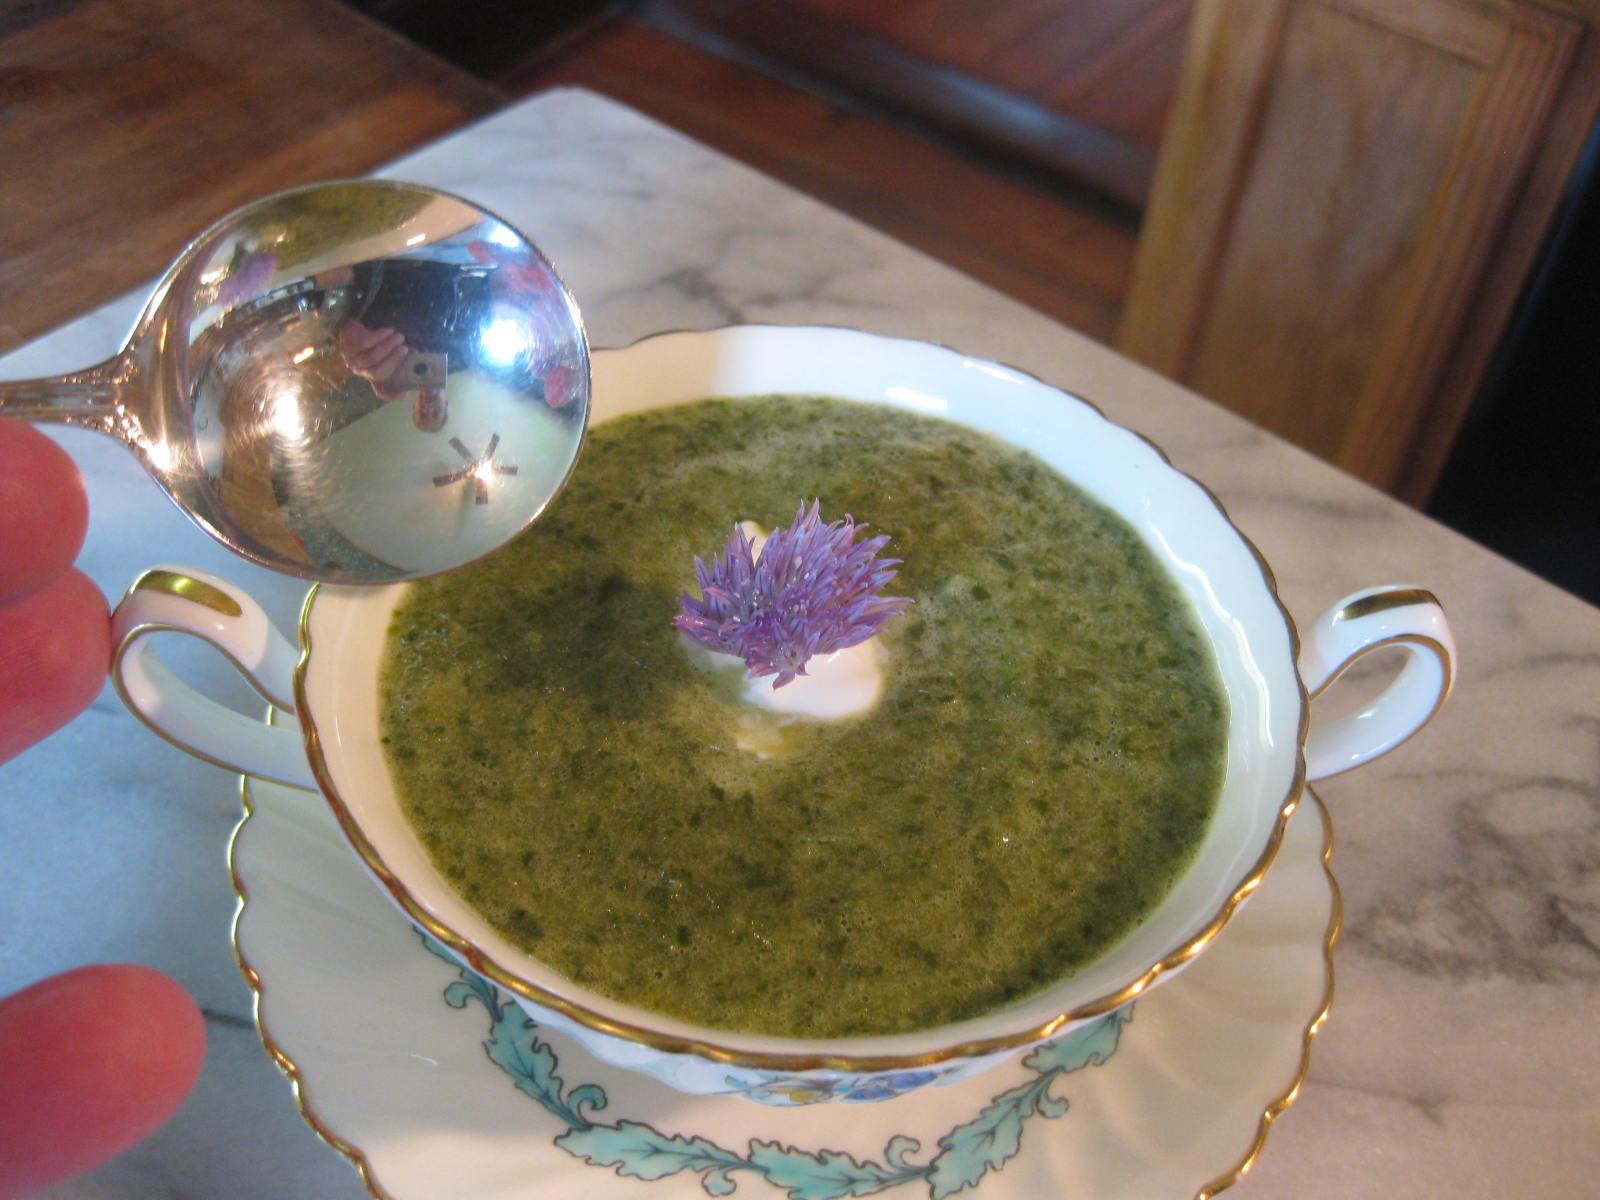 Recipe: Lettuce & Lovage Soup